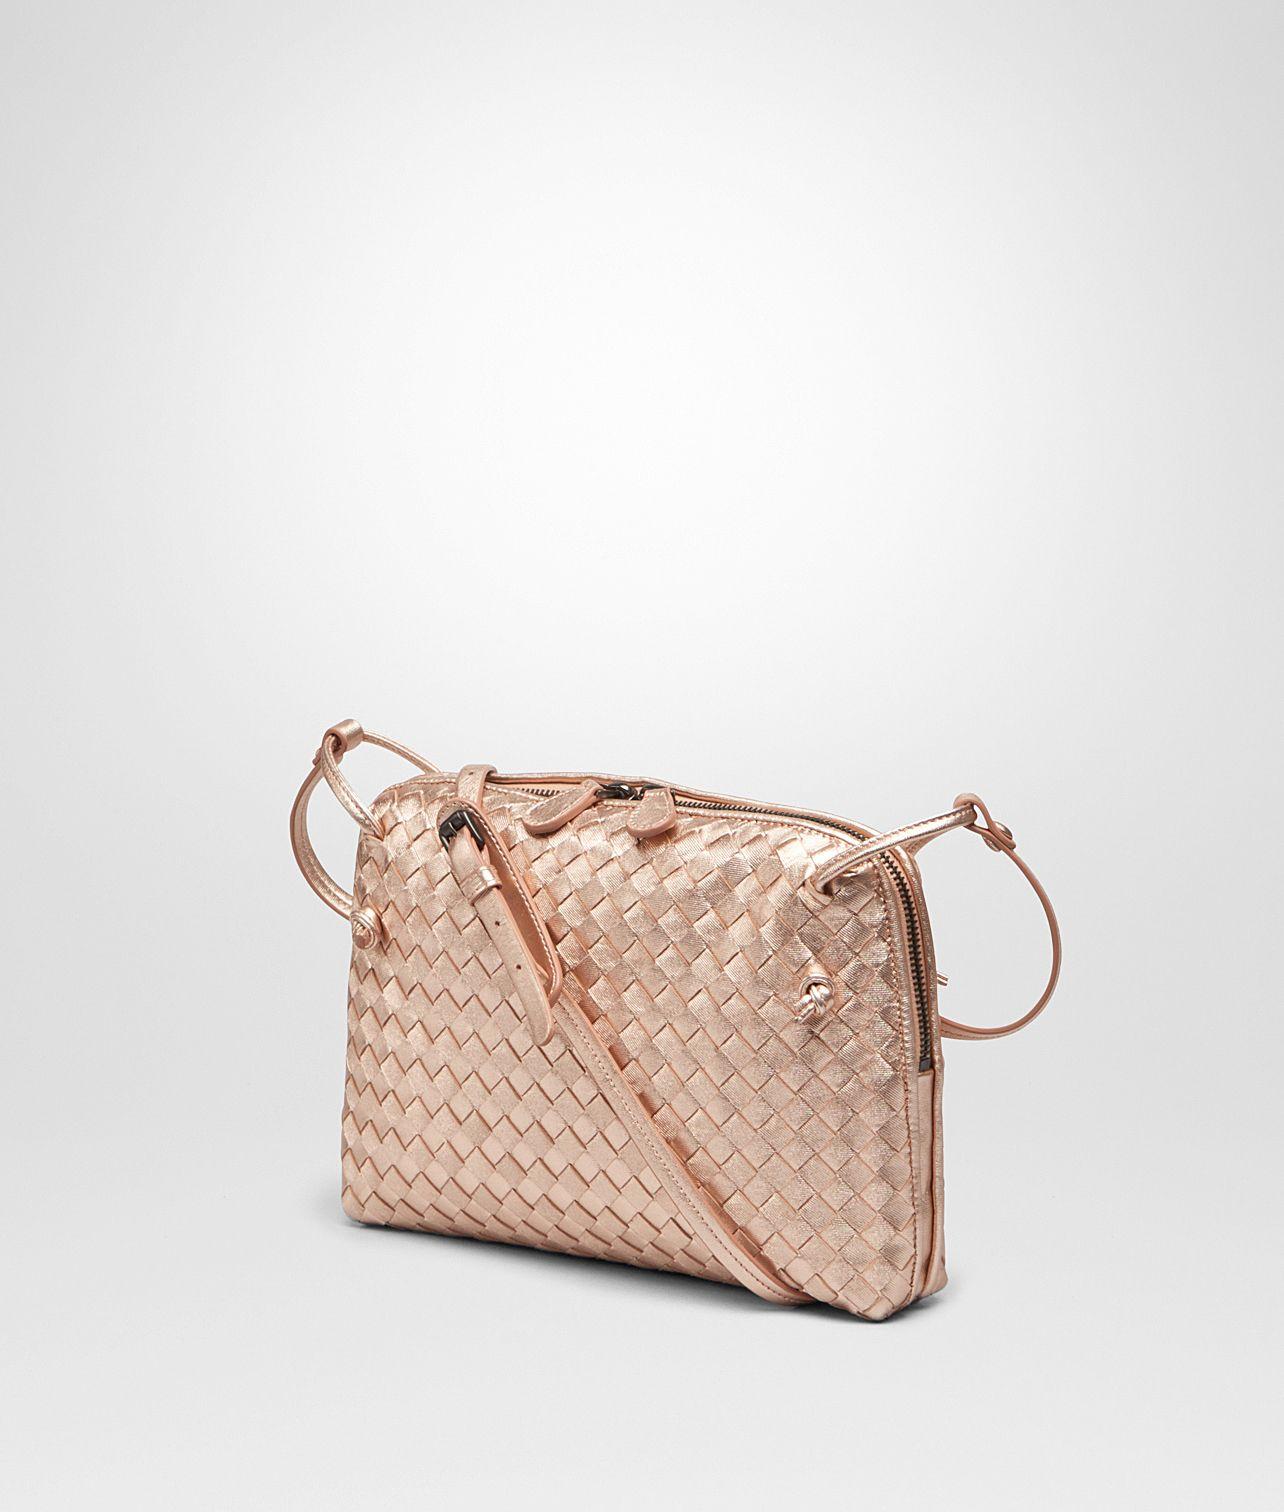 Bottega Veneta® Women s MESSENGER BAG IN ROSE GOLD INTRECCIATO GROS GRAIN. 77ecef85a58cc